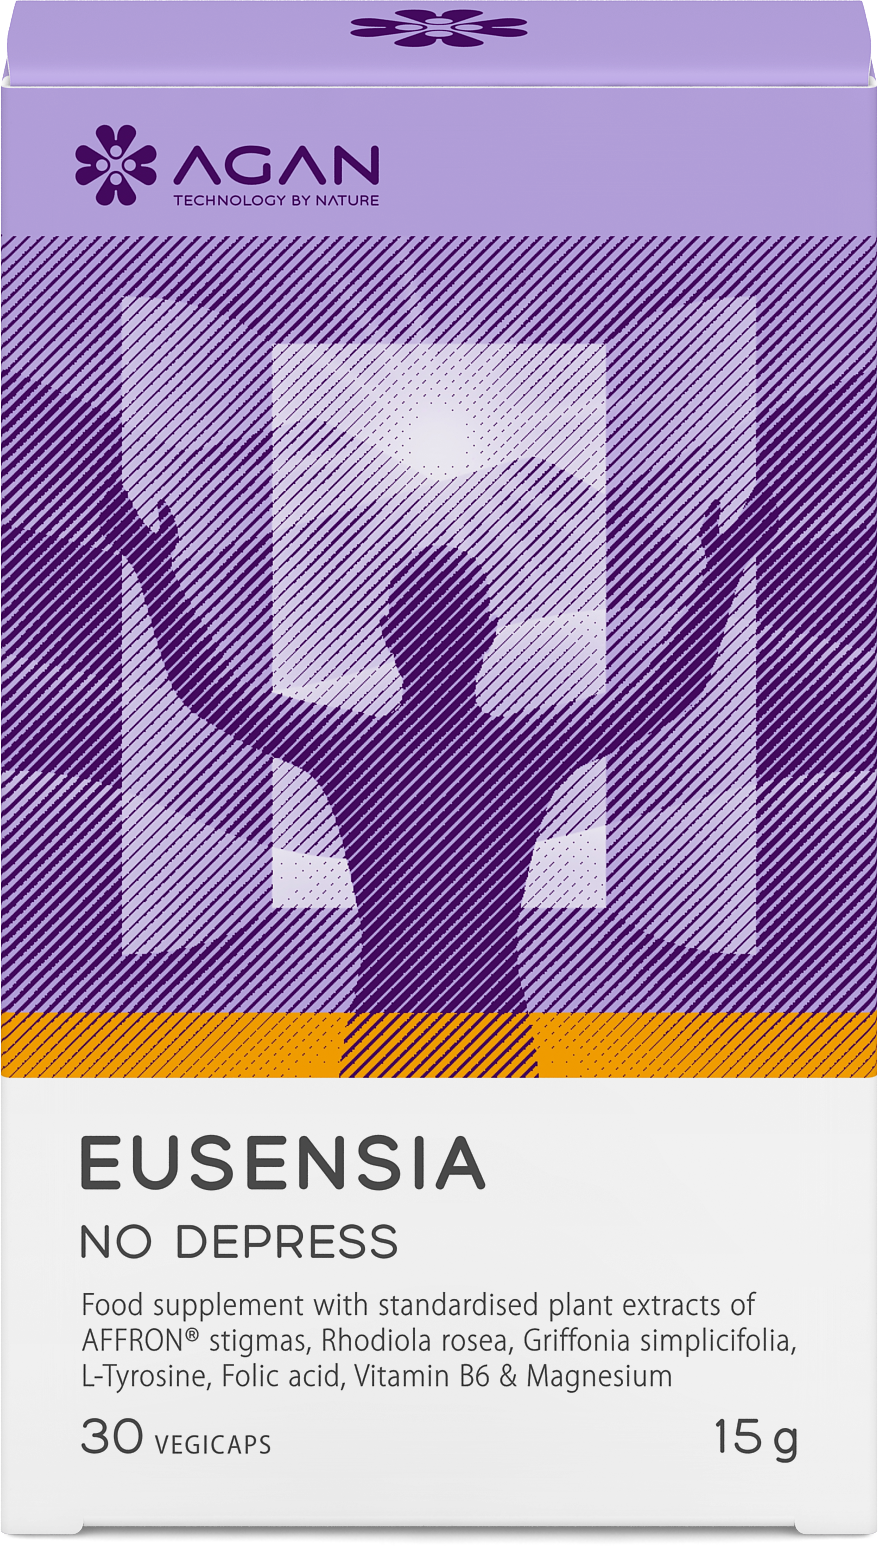 EUSENSIA NO DEPRESS